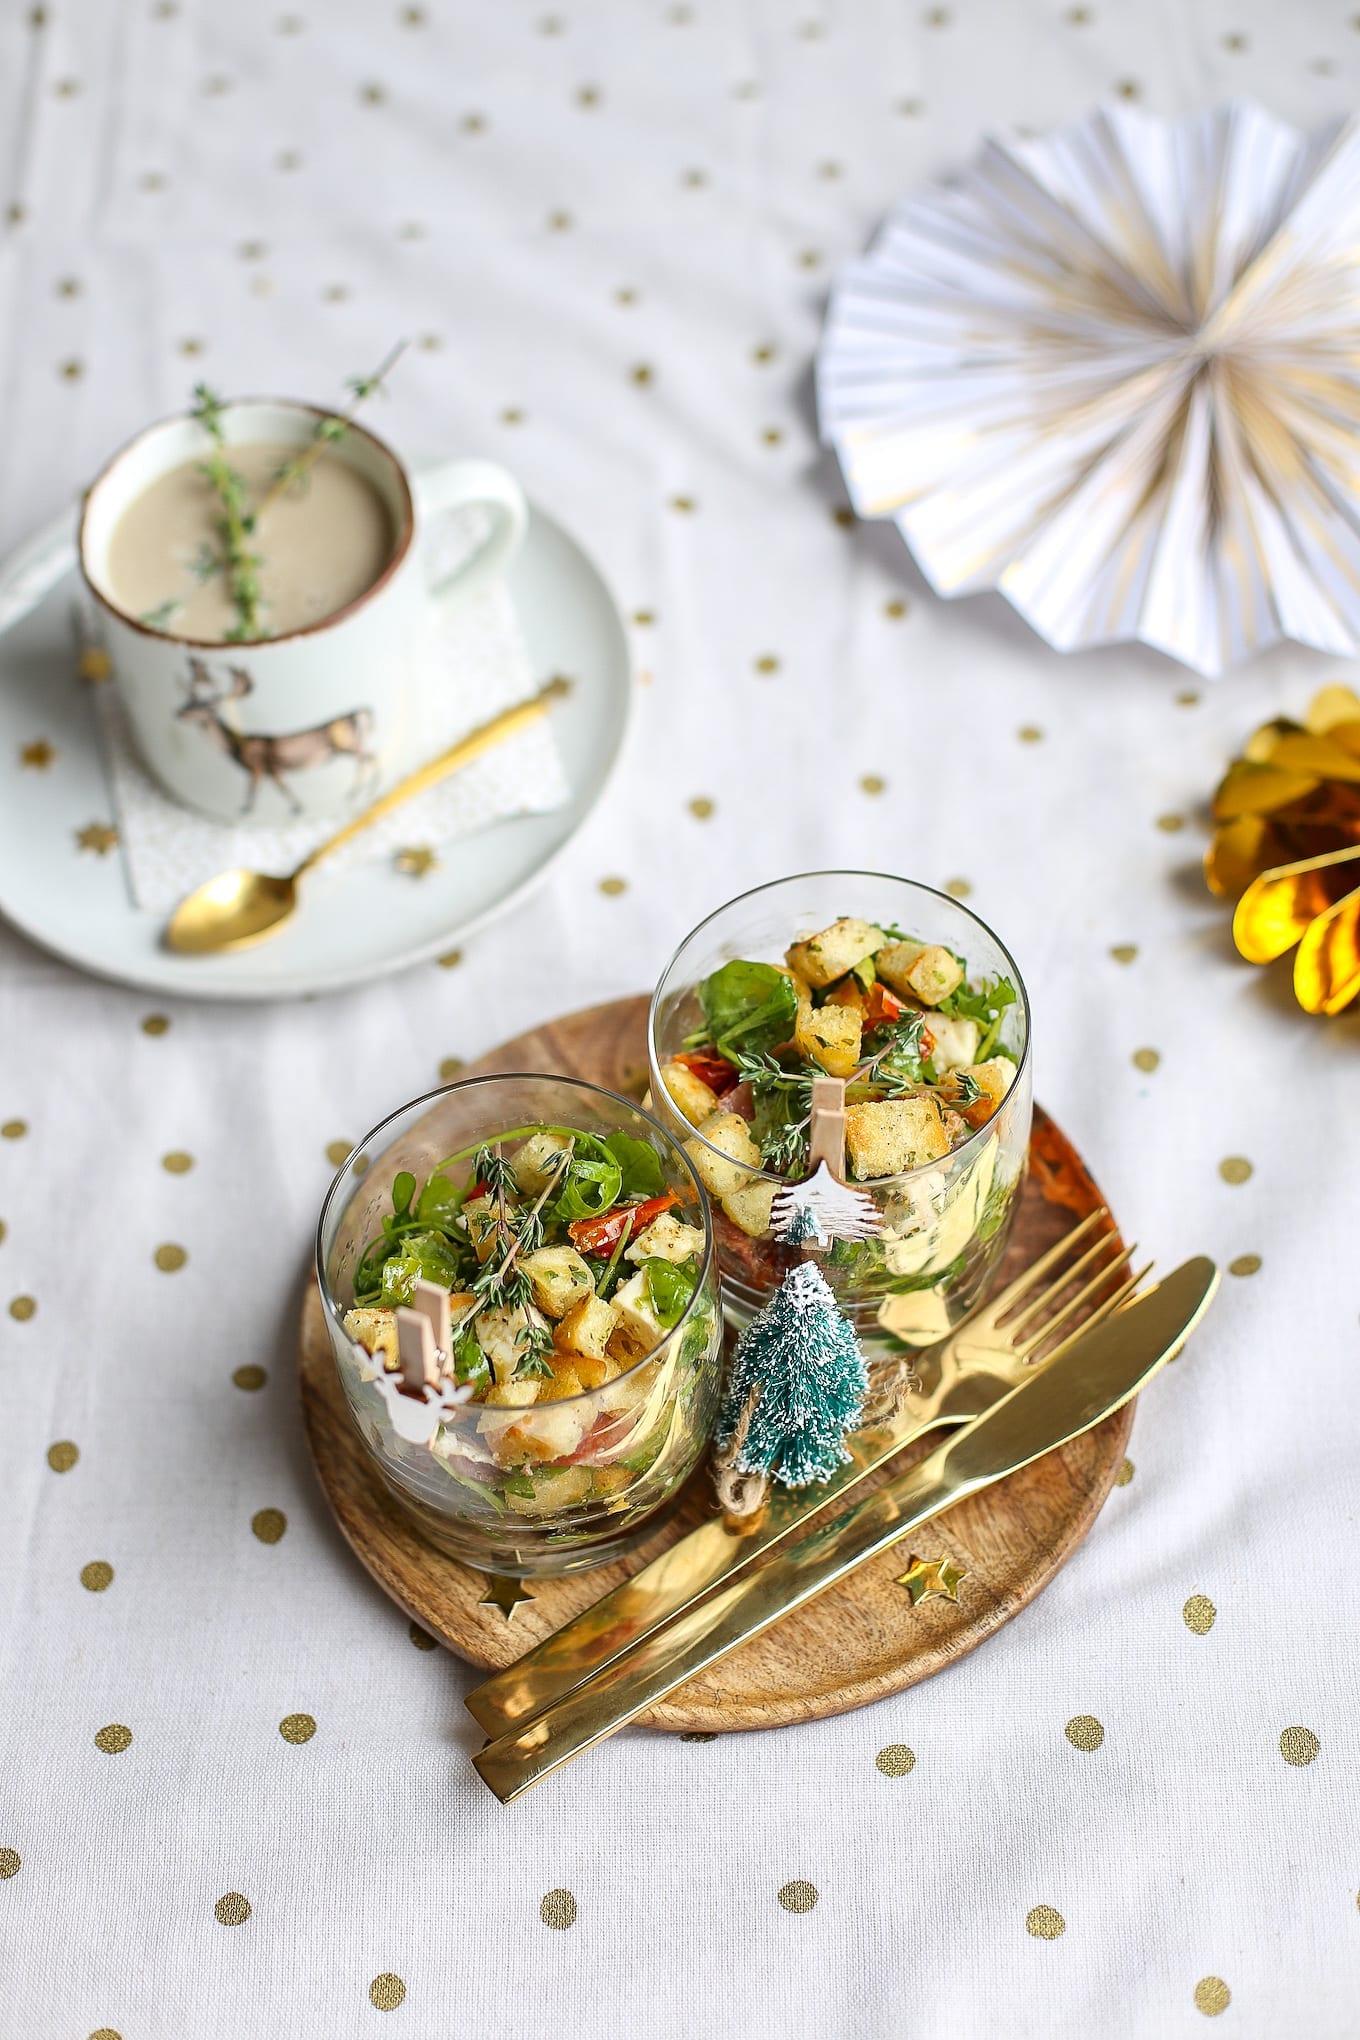 Italiaanse salade in een glaasje